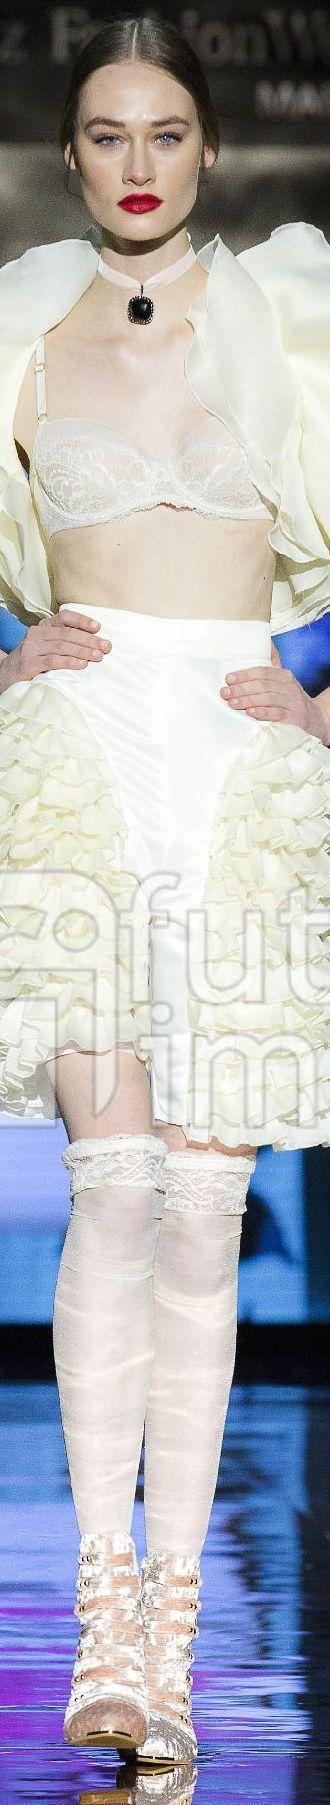 Andres Sarda Mercedes Benz  Fashion Show- AW 2017